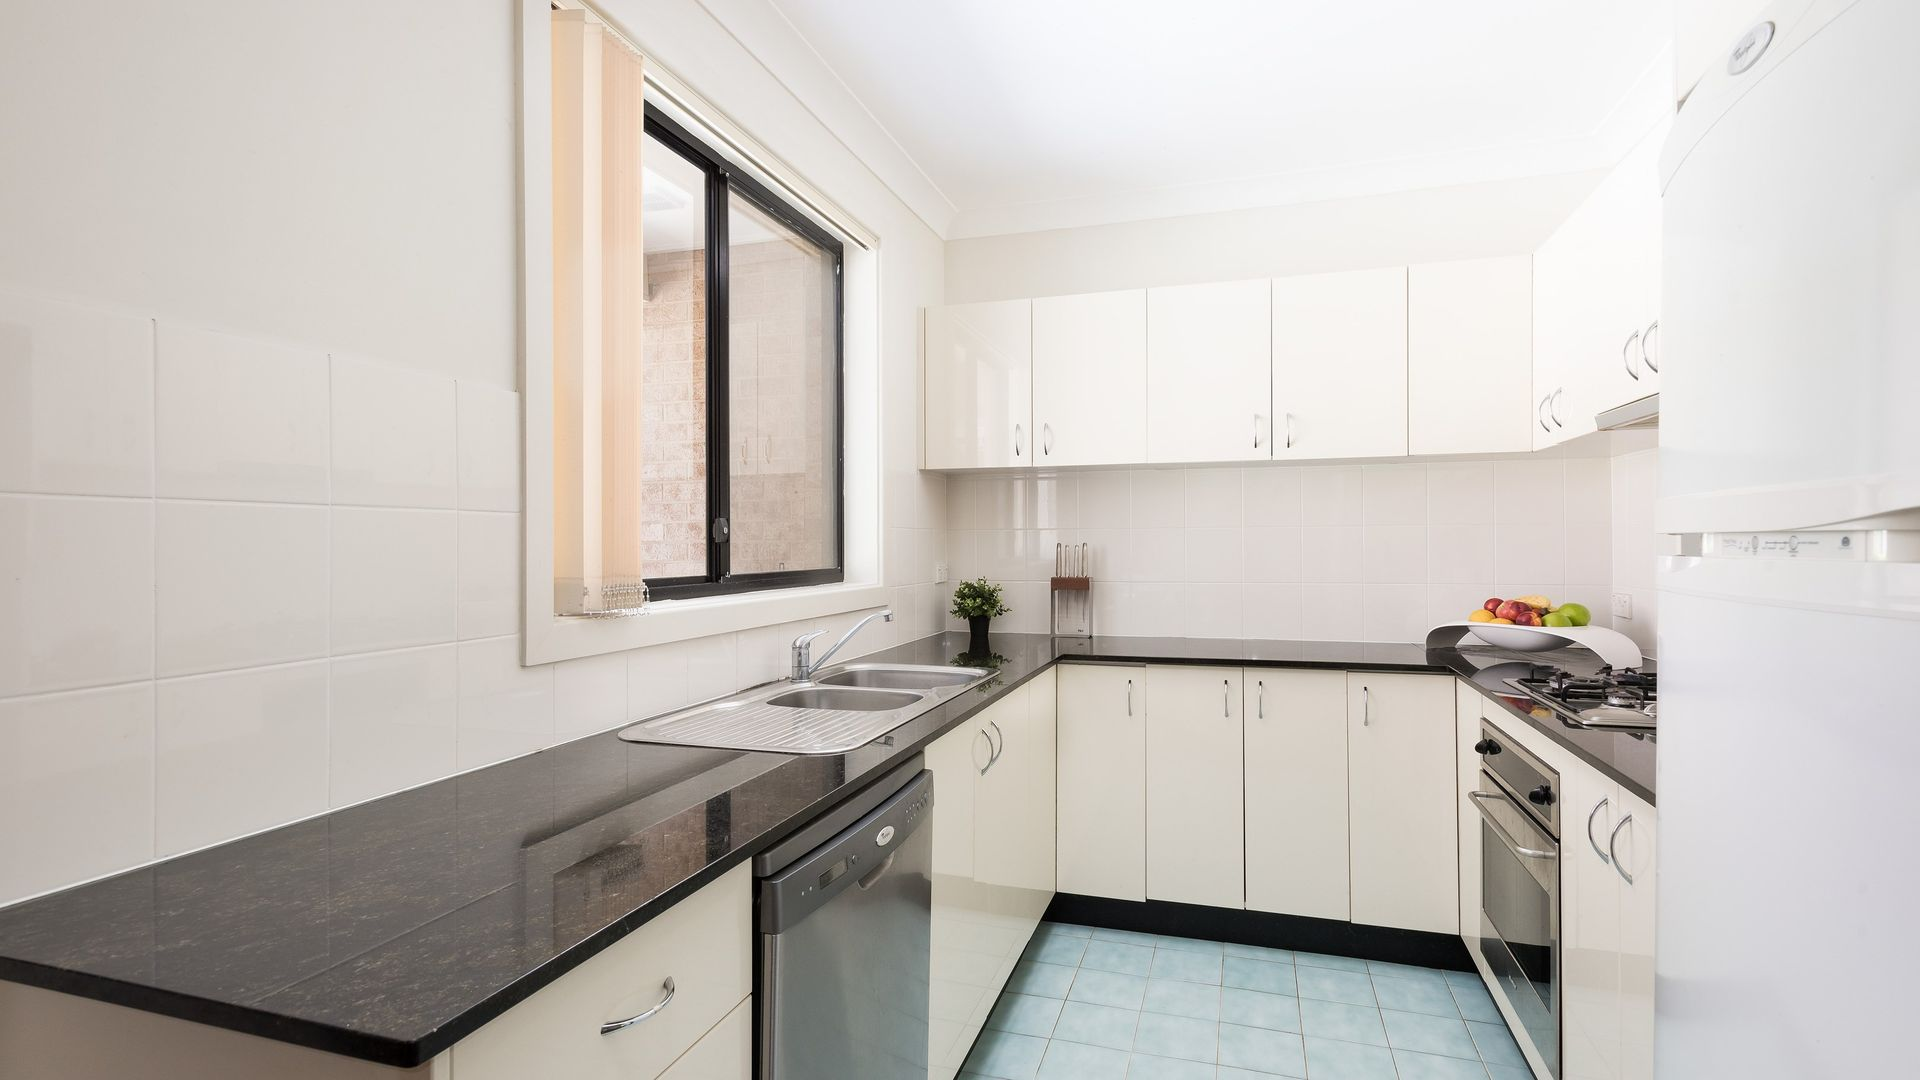 2/60-64 Merton Street, Sutherland NSW 2232, Image 2